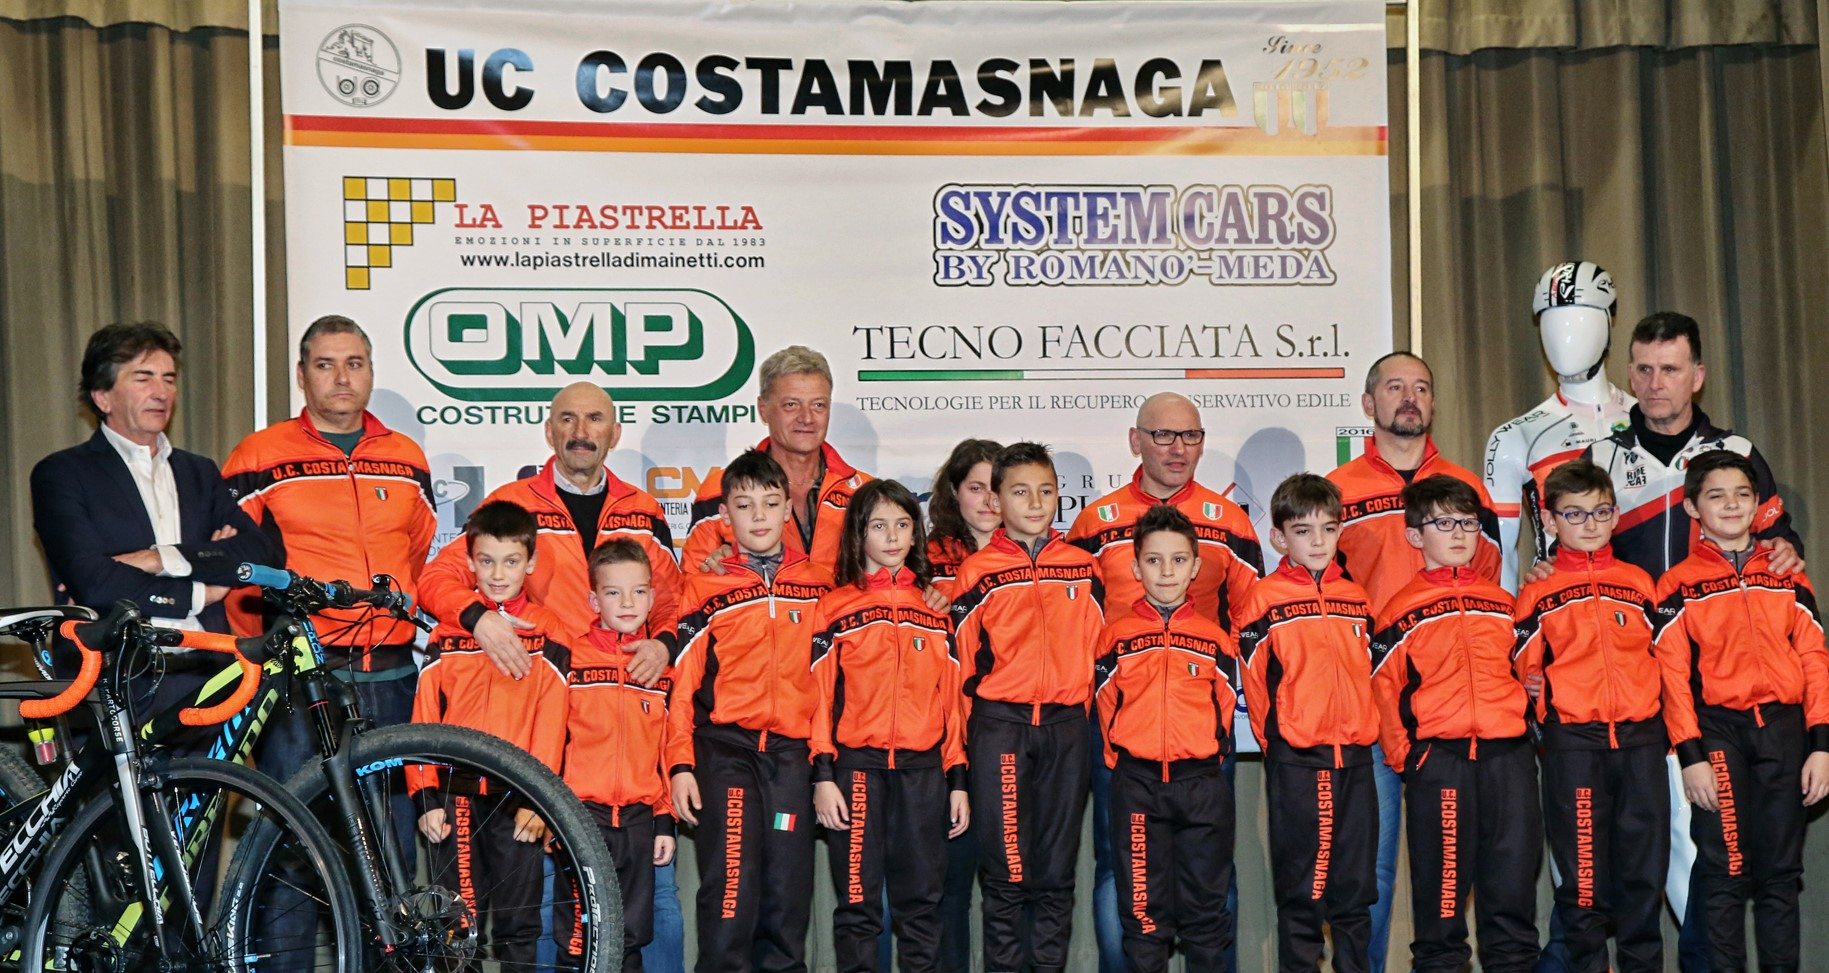 I Giovanissimi dell'Uc Costamasnaga 2018